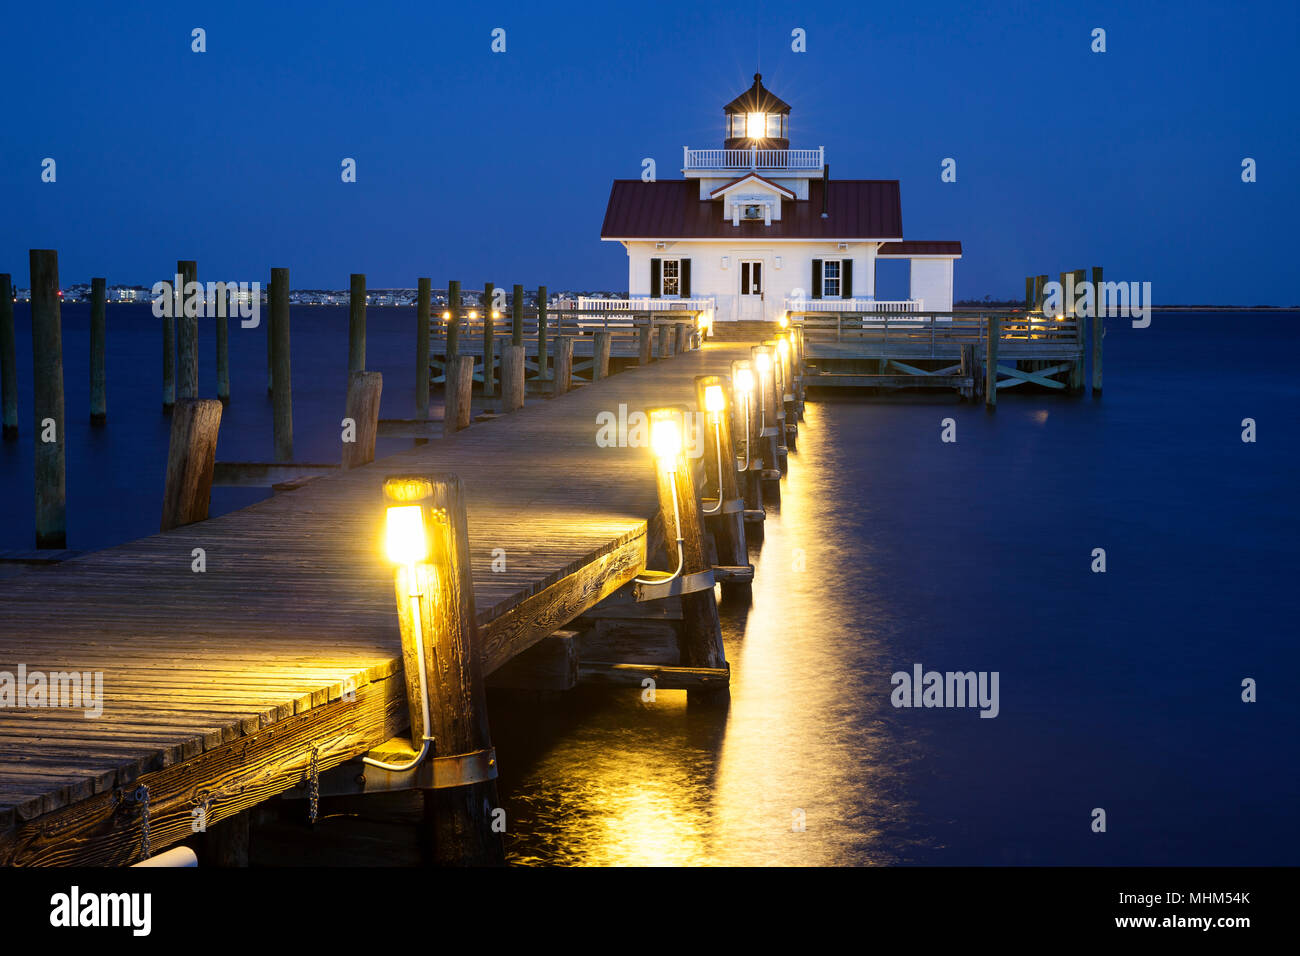 NC01686-00...NORTH CAROLINA - Roanoke Marshes Lighthouse in the town of Manteo on Roanoke Island. - Stock Image